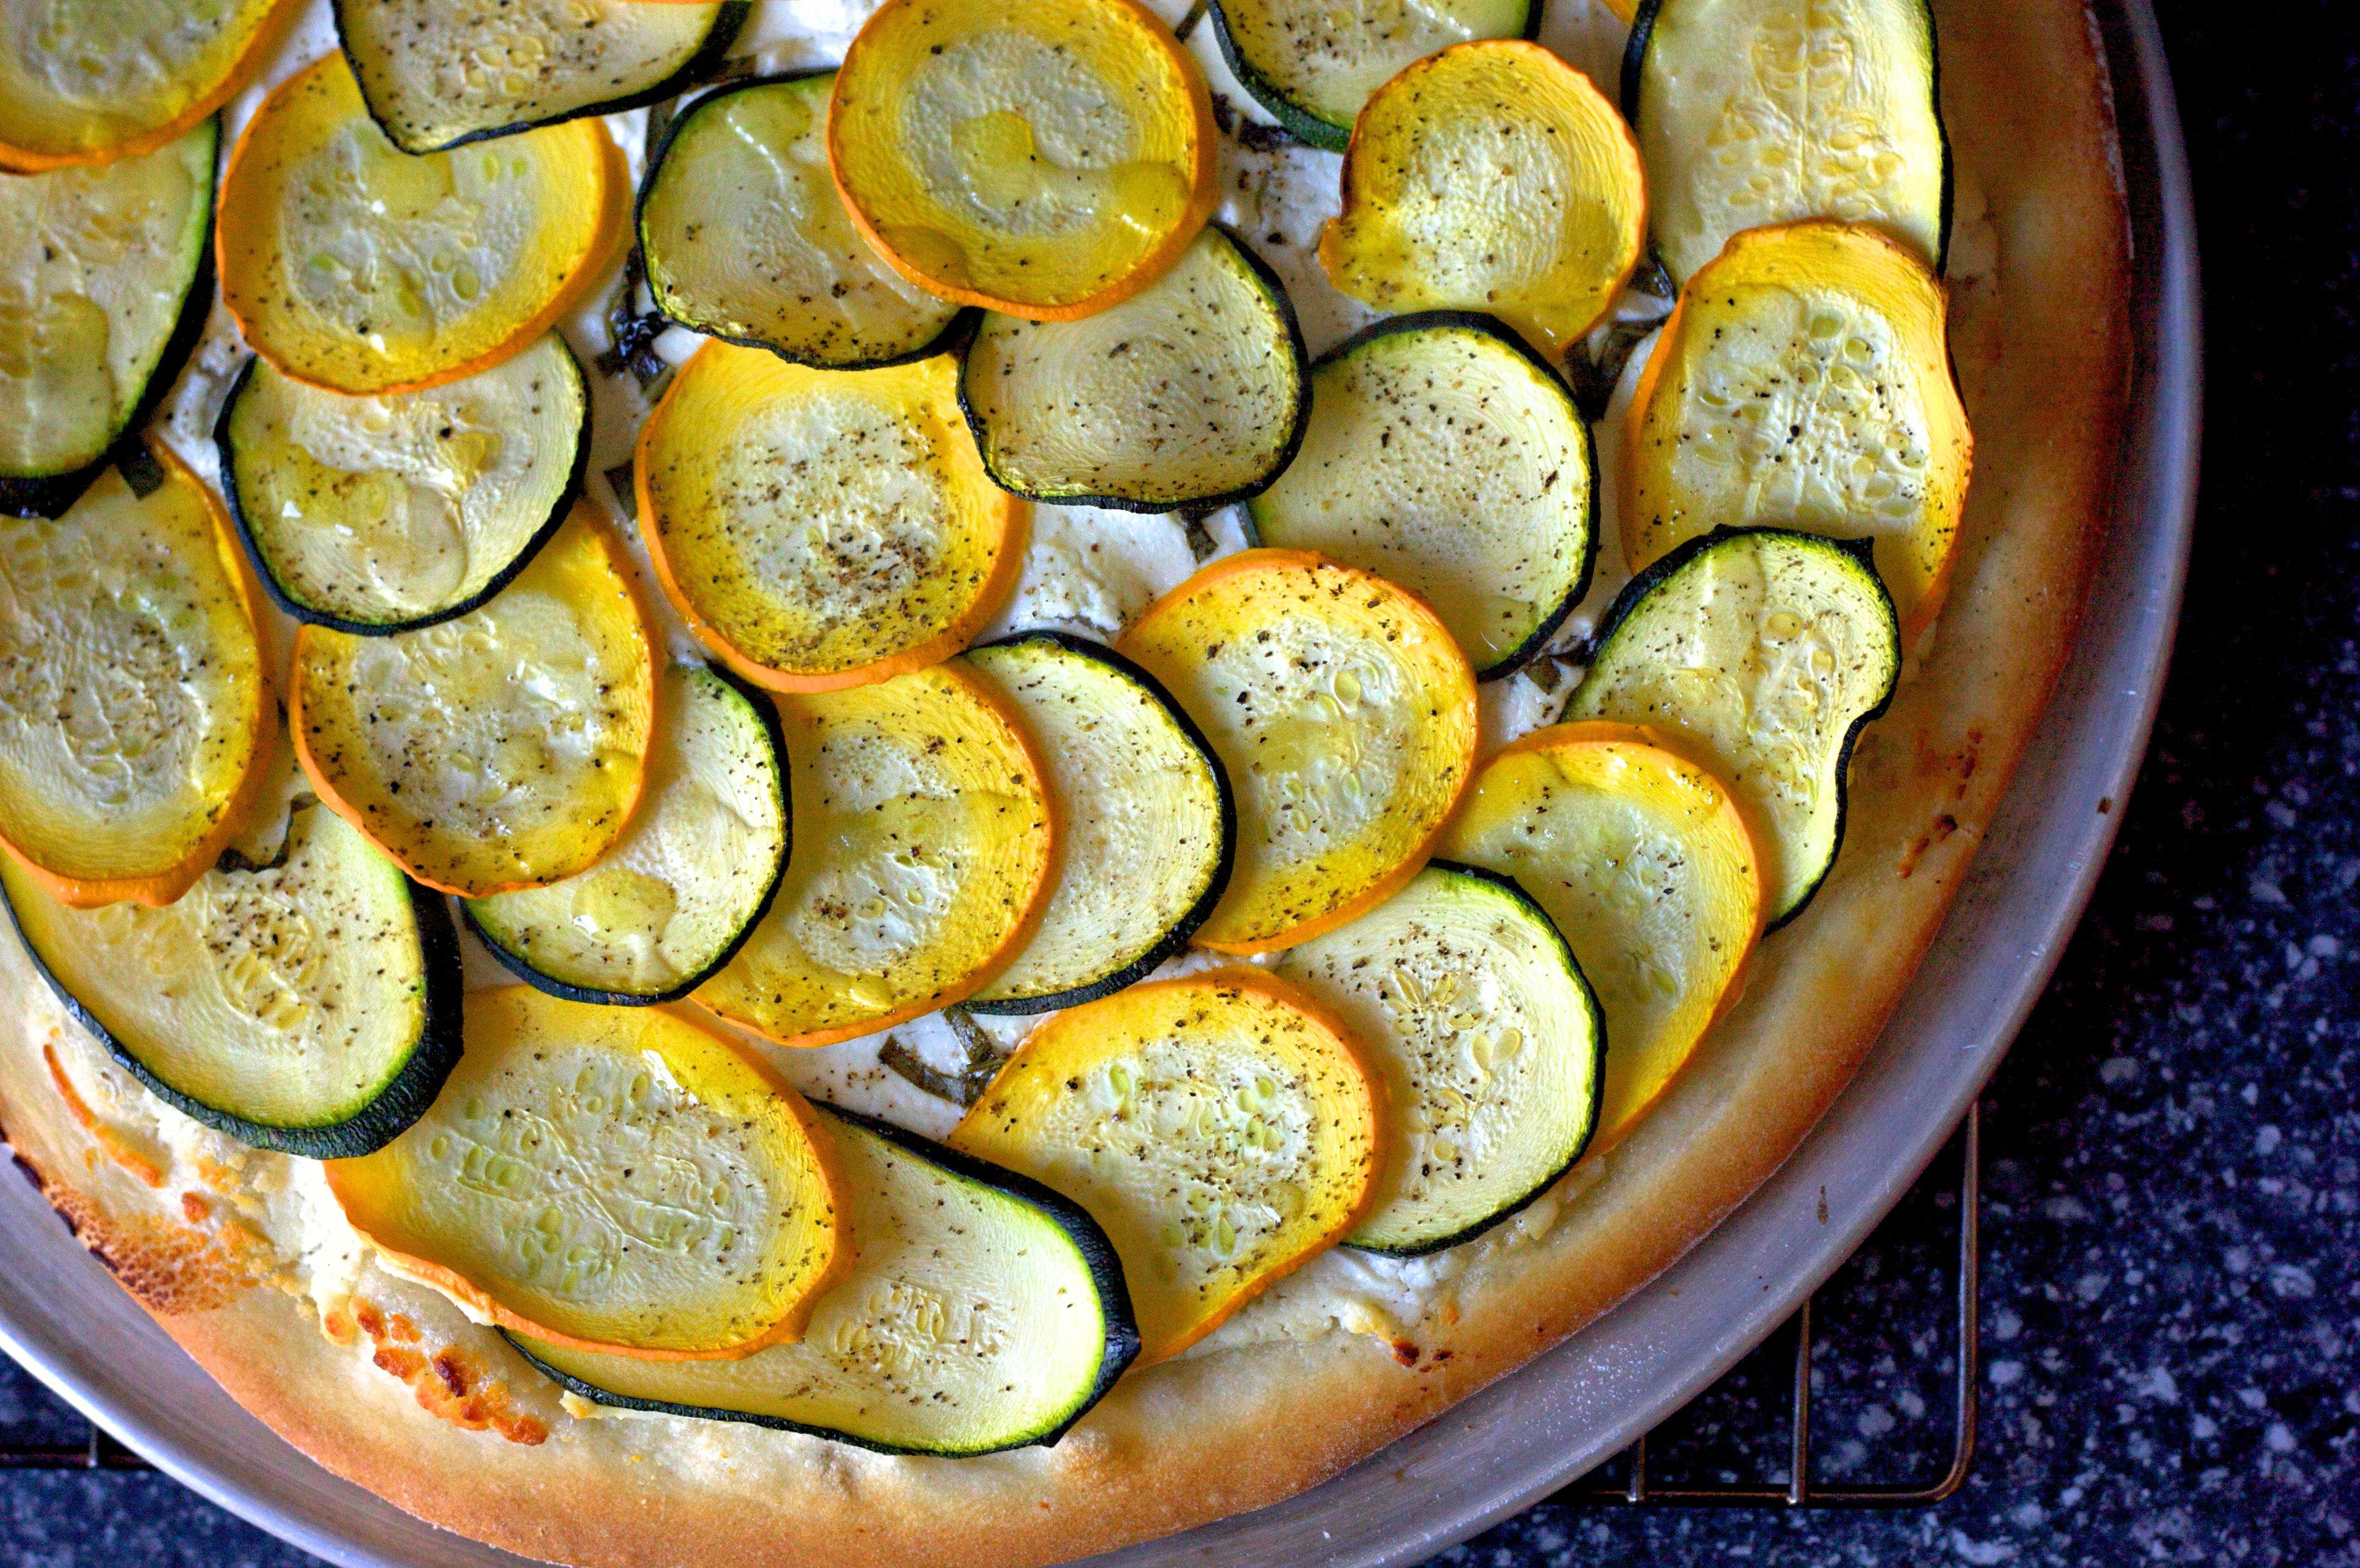 Lemony Zucchini Goat Cheese Pizza Smitten Kitchen